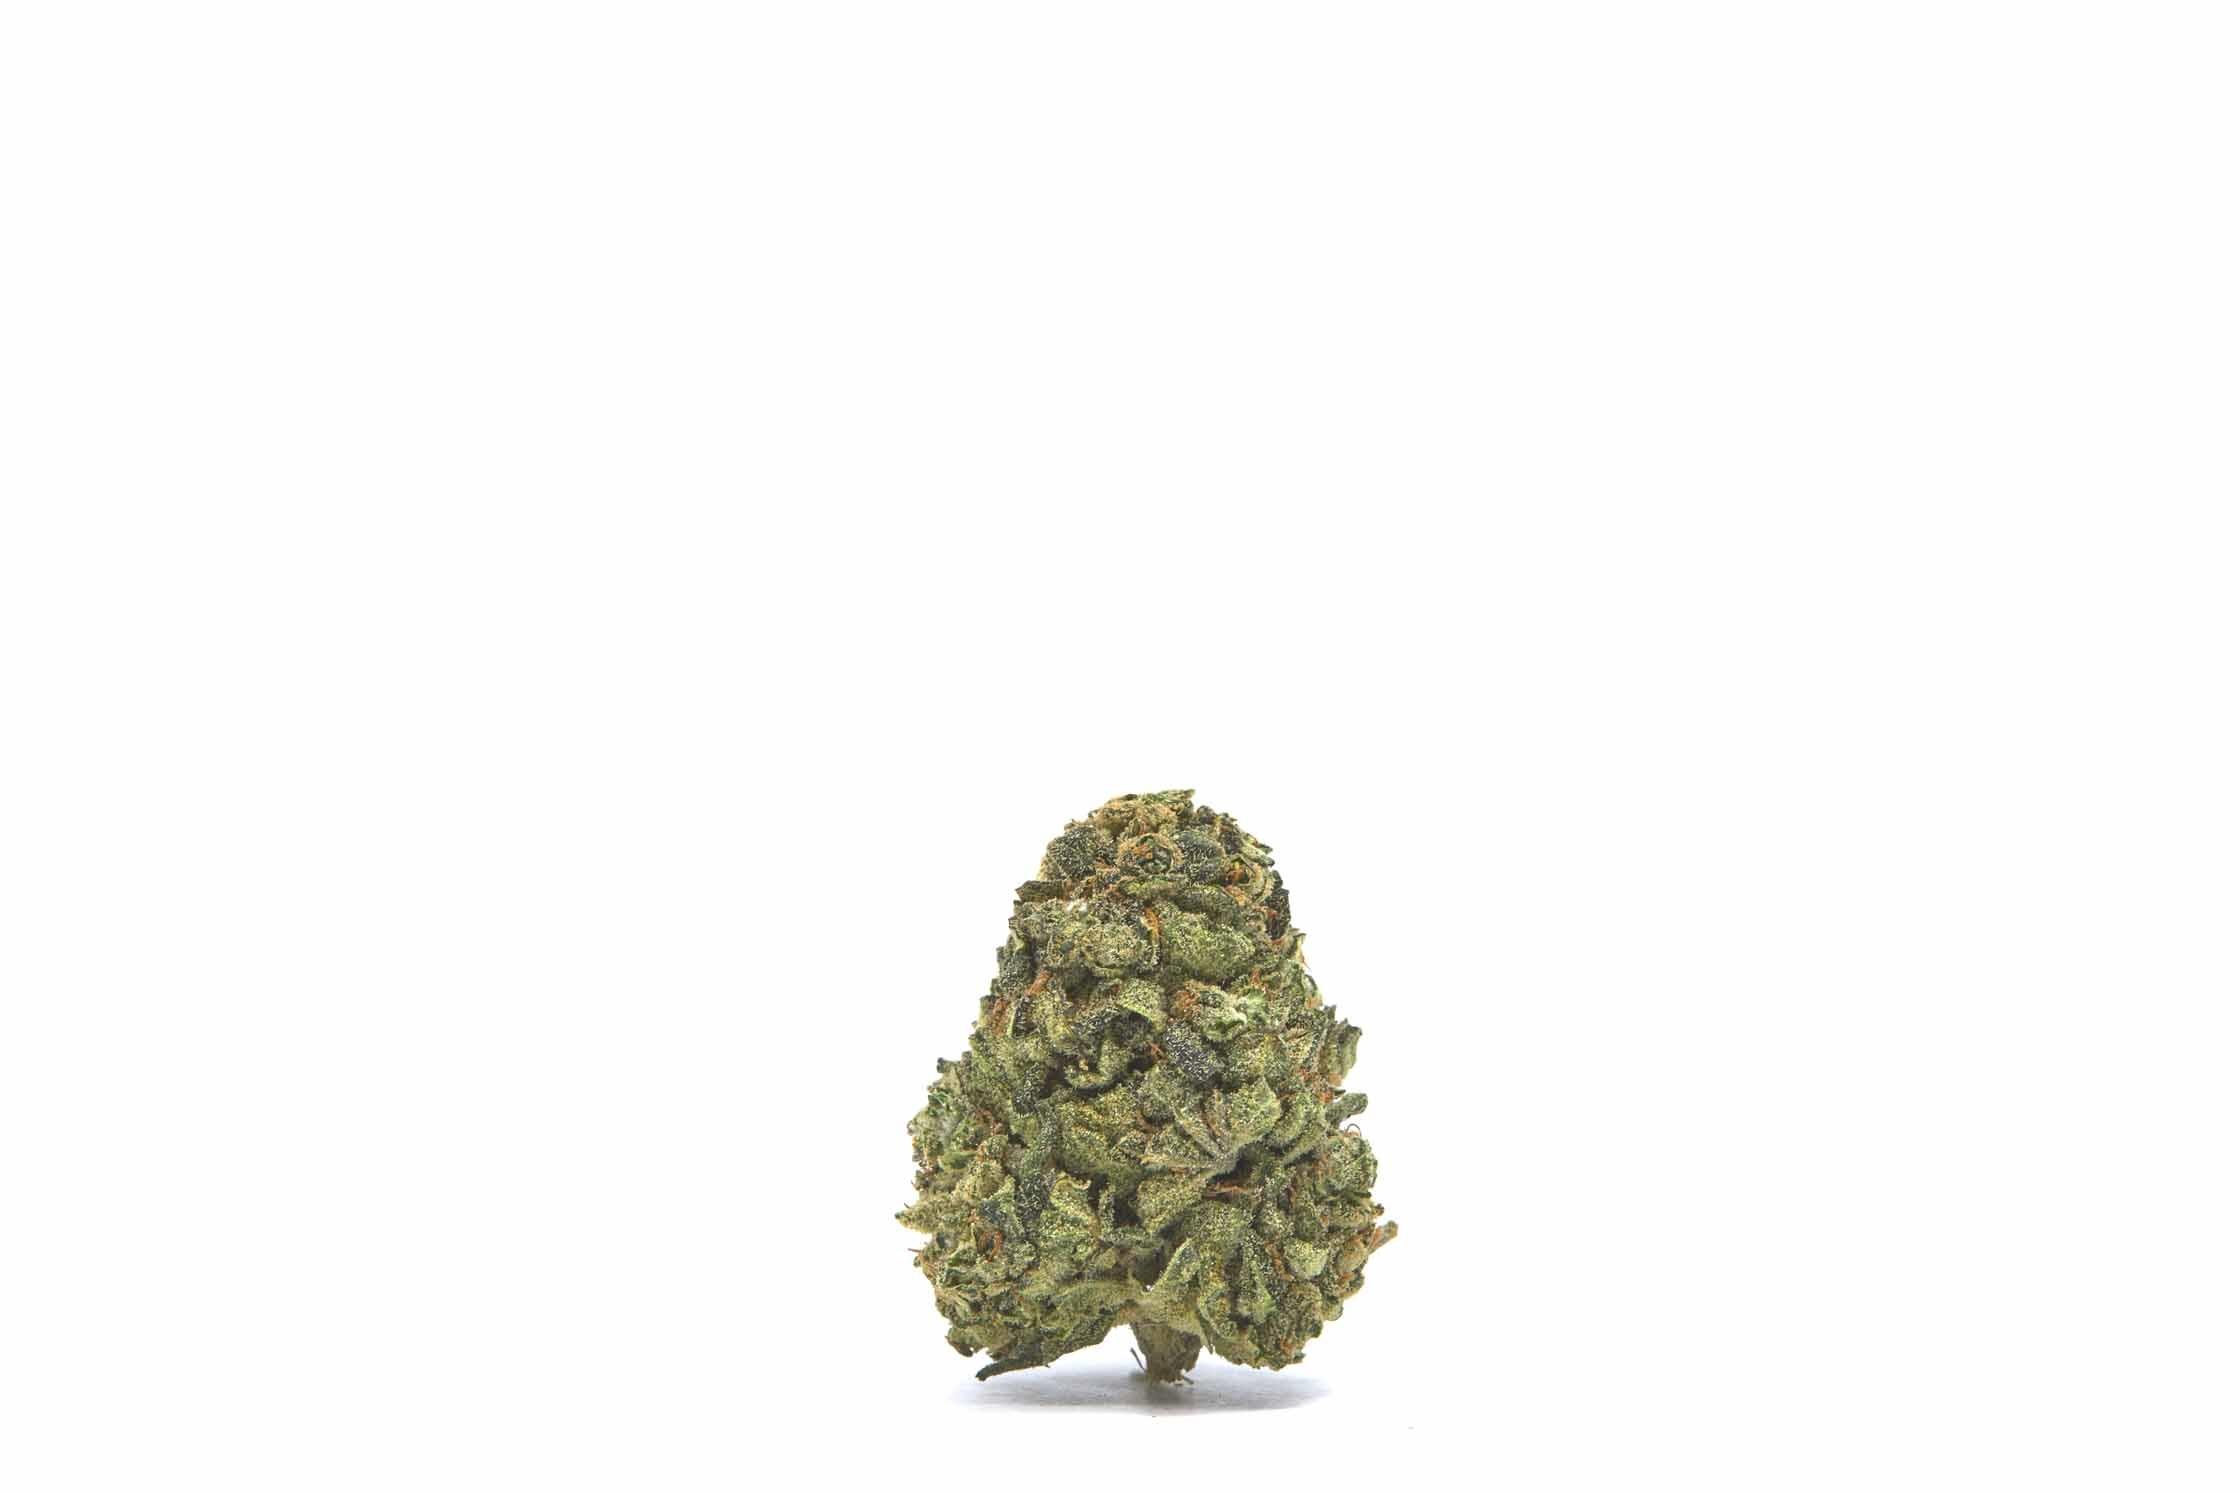 Key Lime Pie CBD hemp flower for sale online